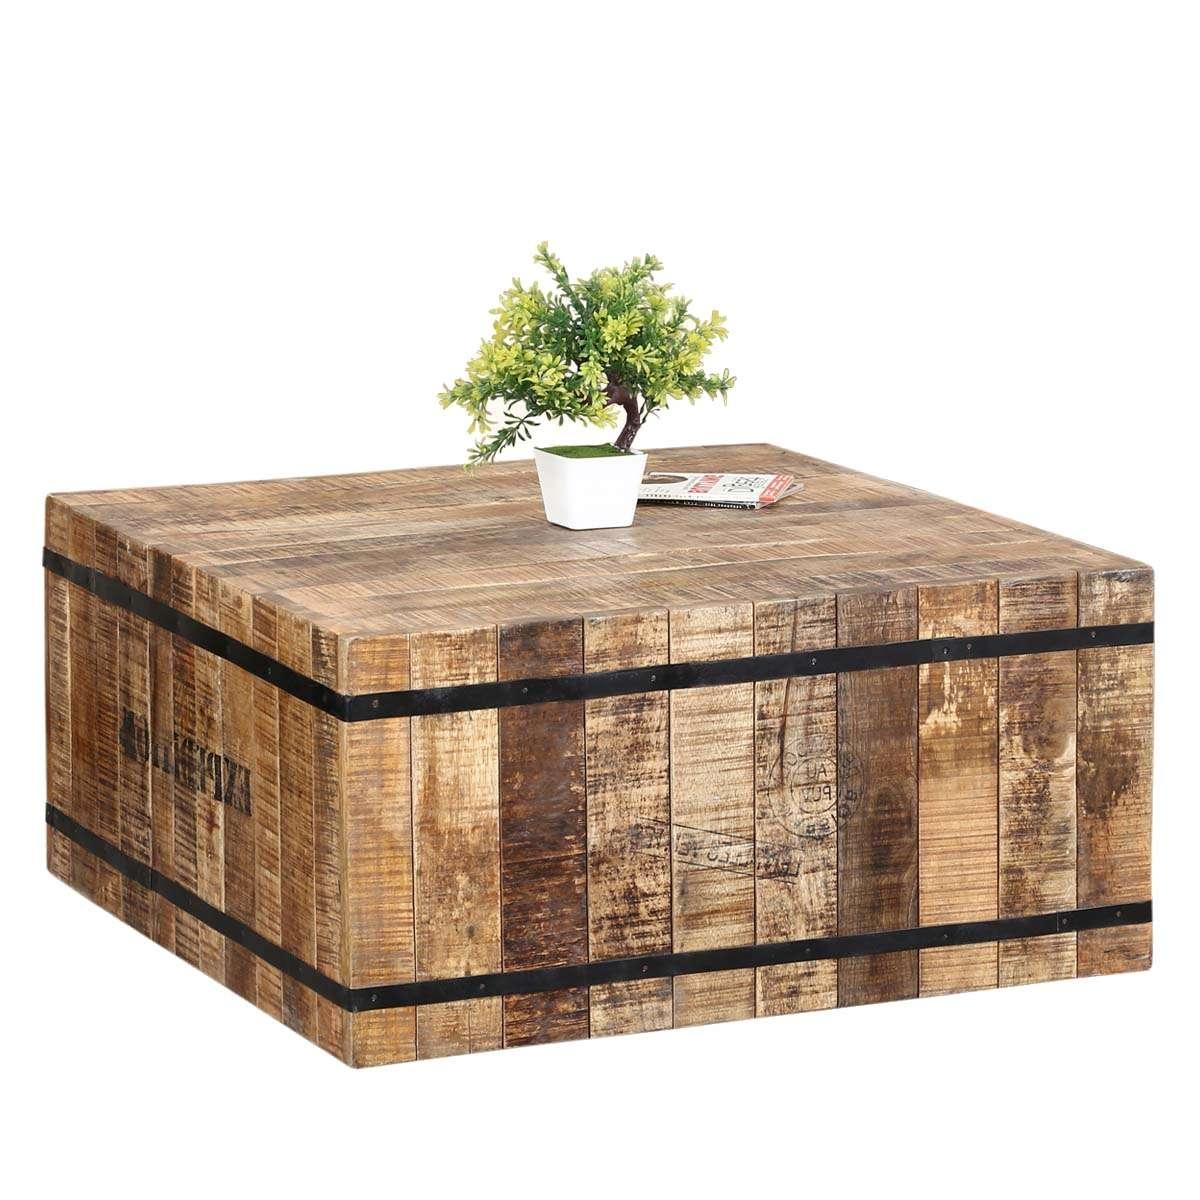 2018 Mango Wood Coffee Tables Regarding Rustic Mango Wood & Iron Square Box Style Coffee Table (View 2 of 20)